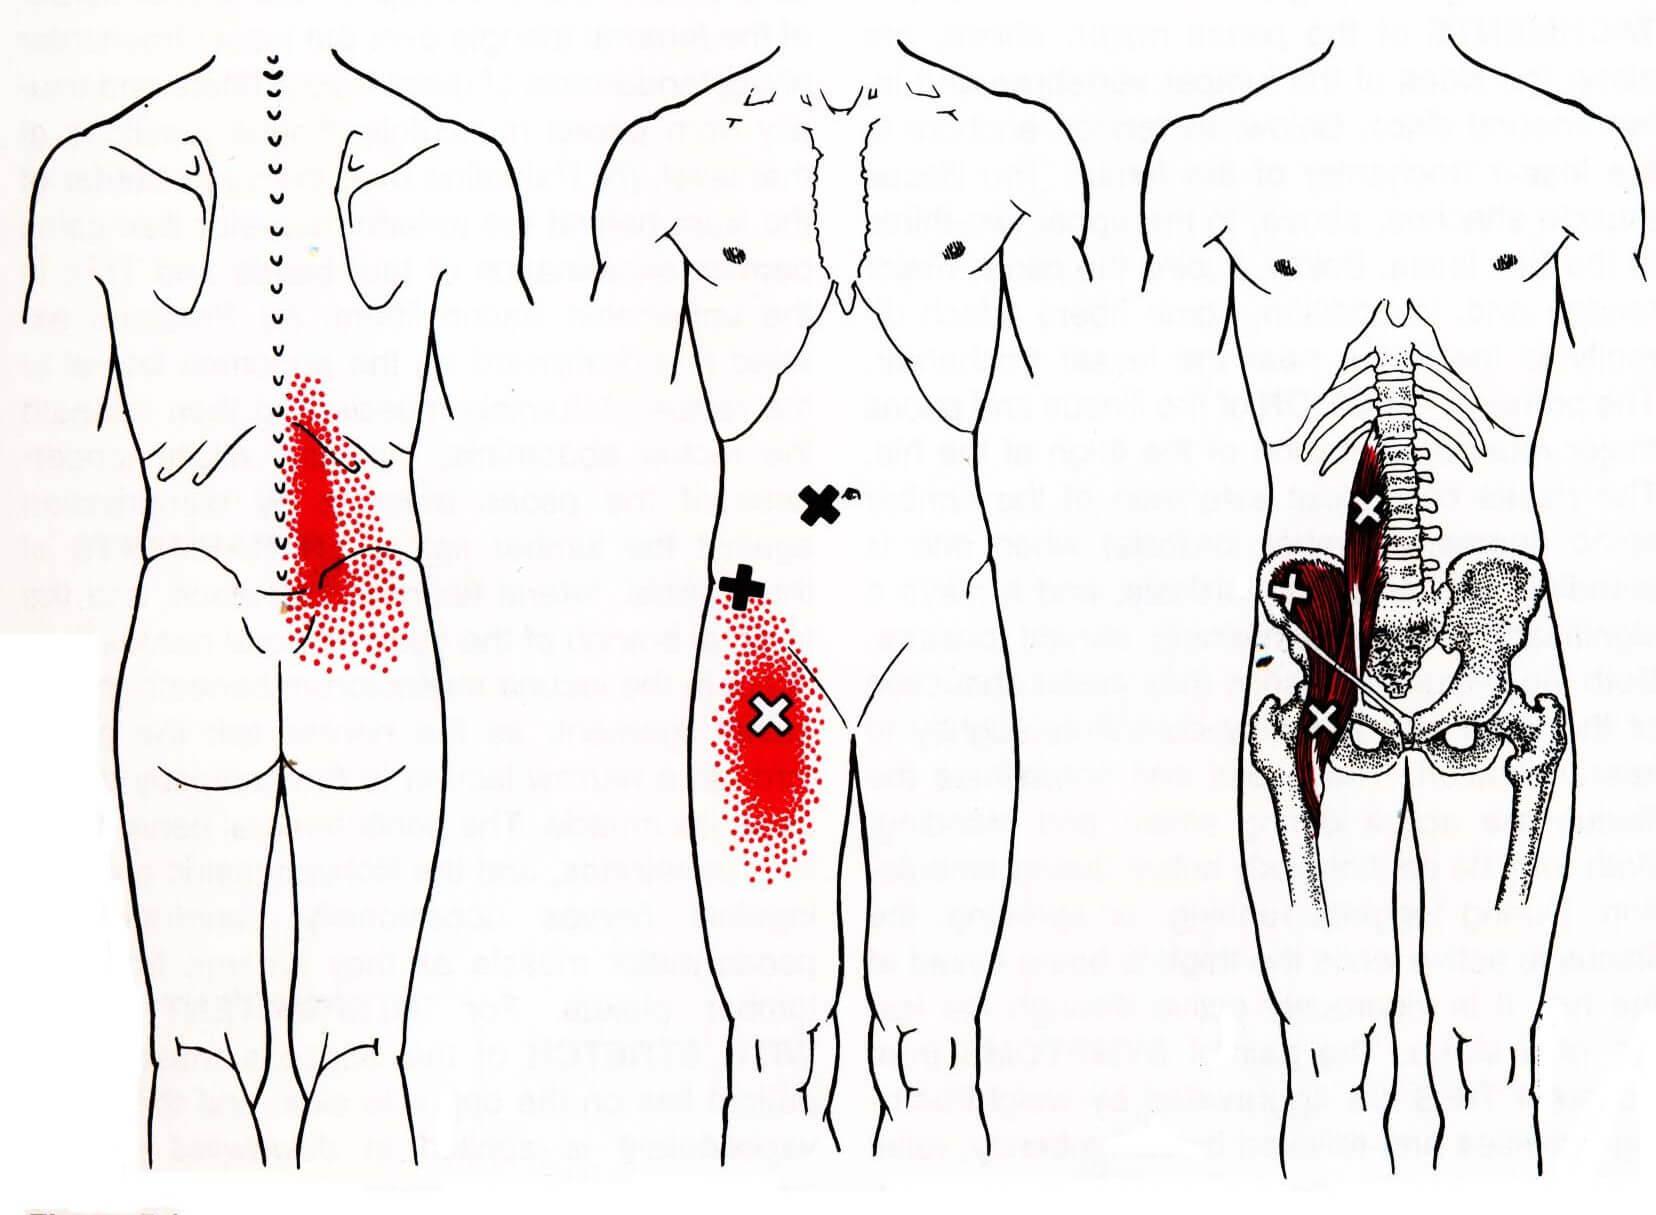 Локализация боли в области таза